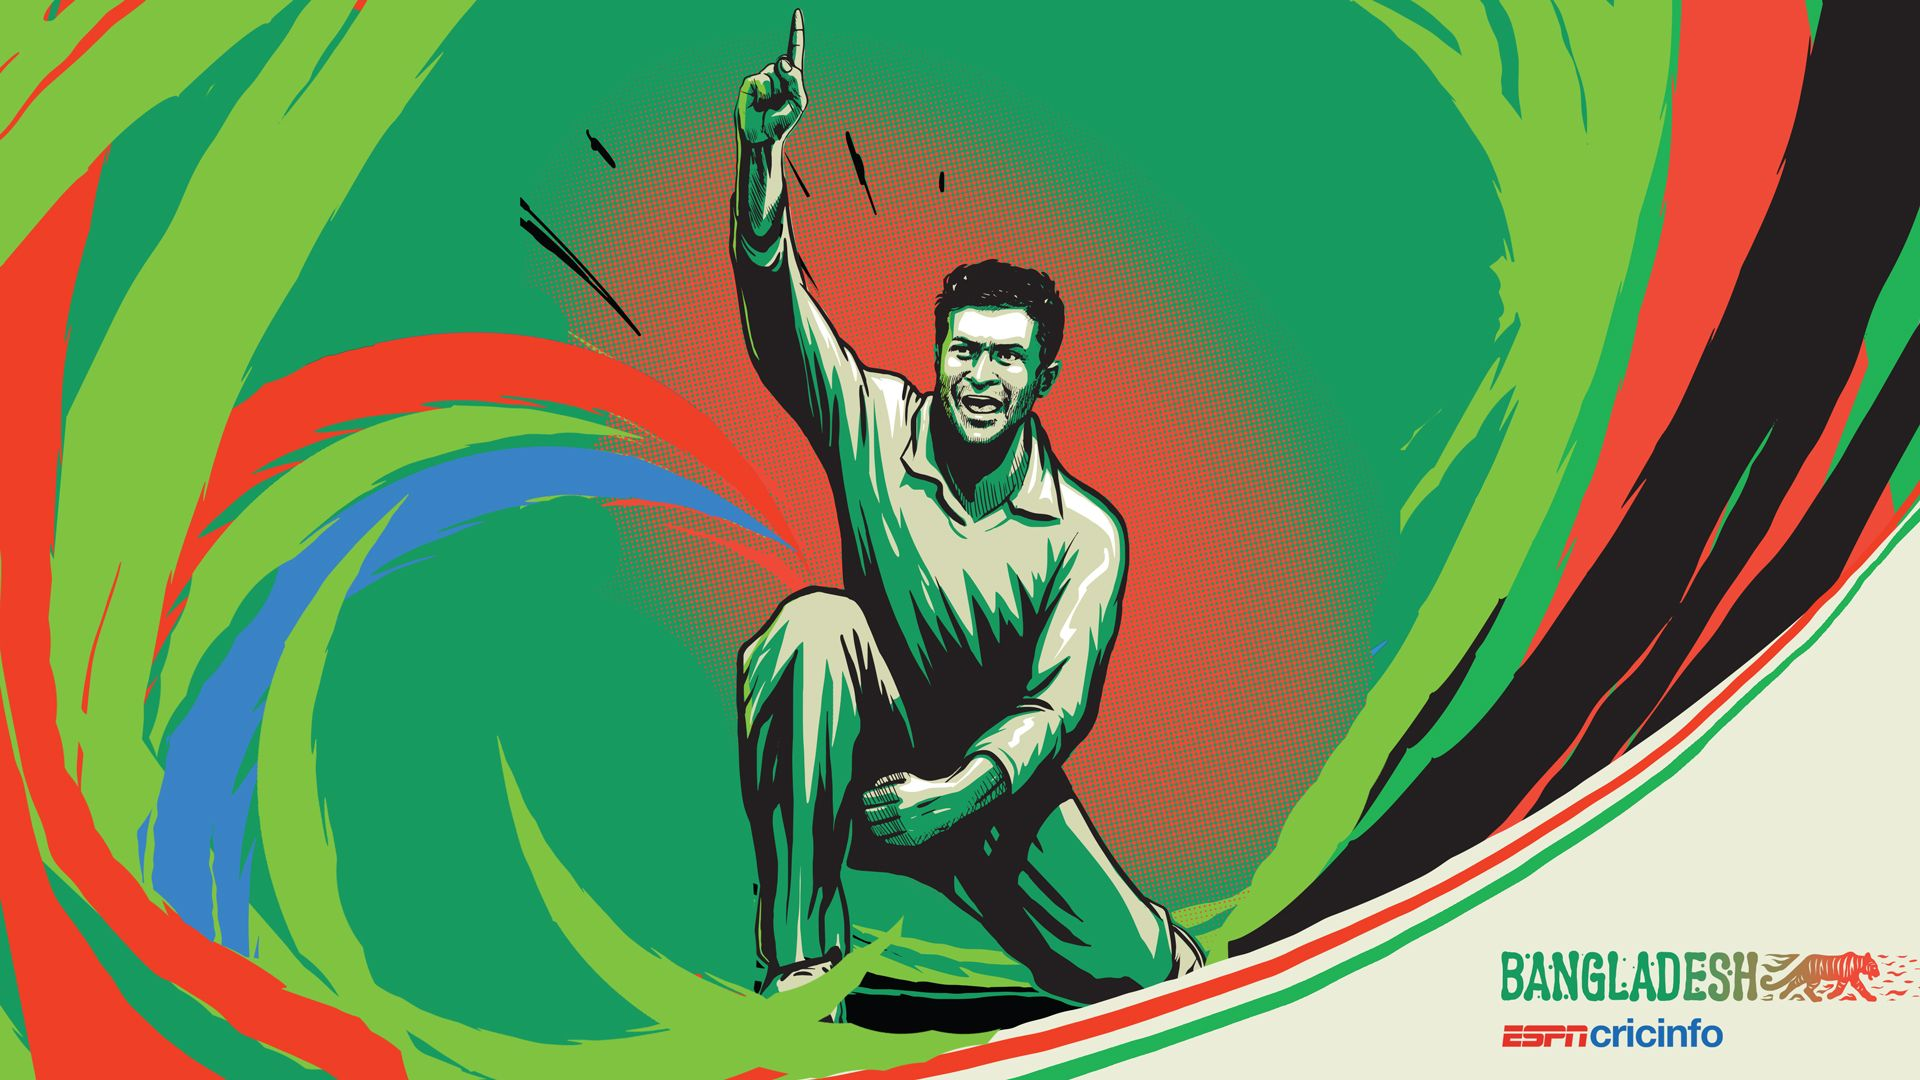 Bangladeshi Cricket Team Zoom Background 2